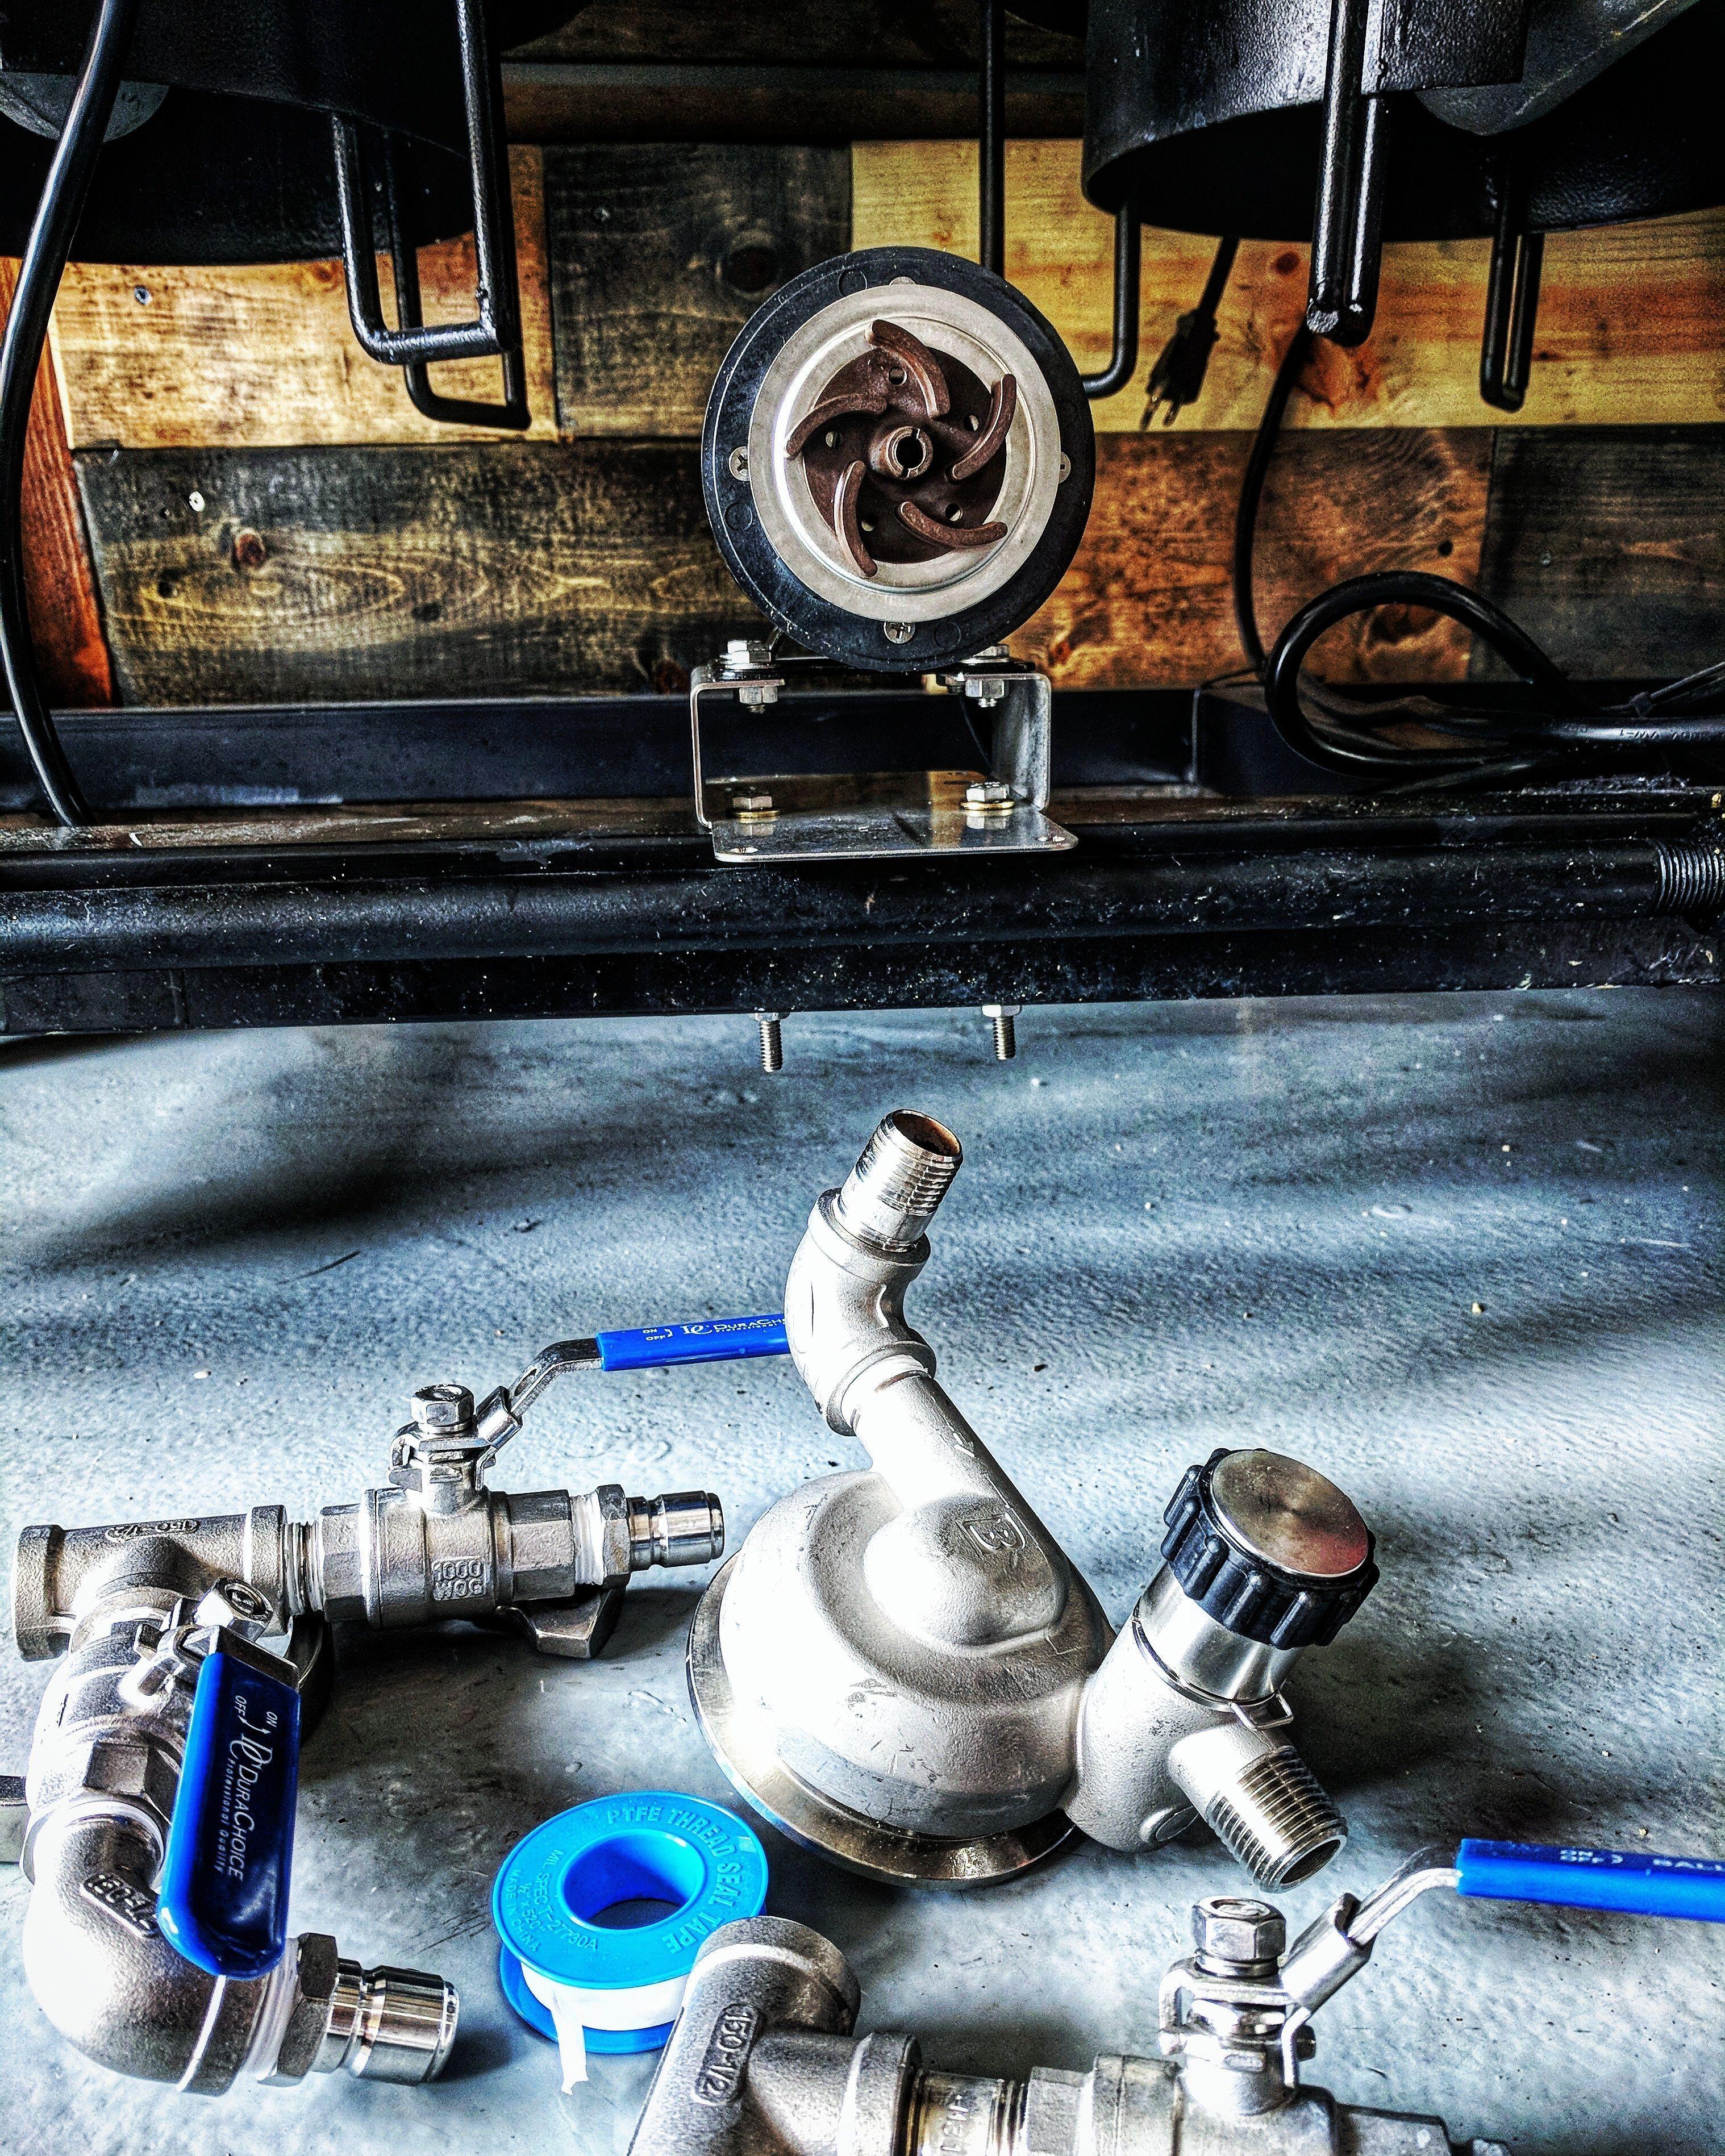 Homebrewing rig RipTide Homebrew Pump Upgrade Kit  Blichmann RipTide Home Brewing Pump Upgrade Kit